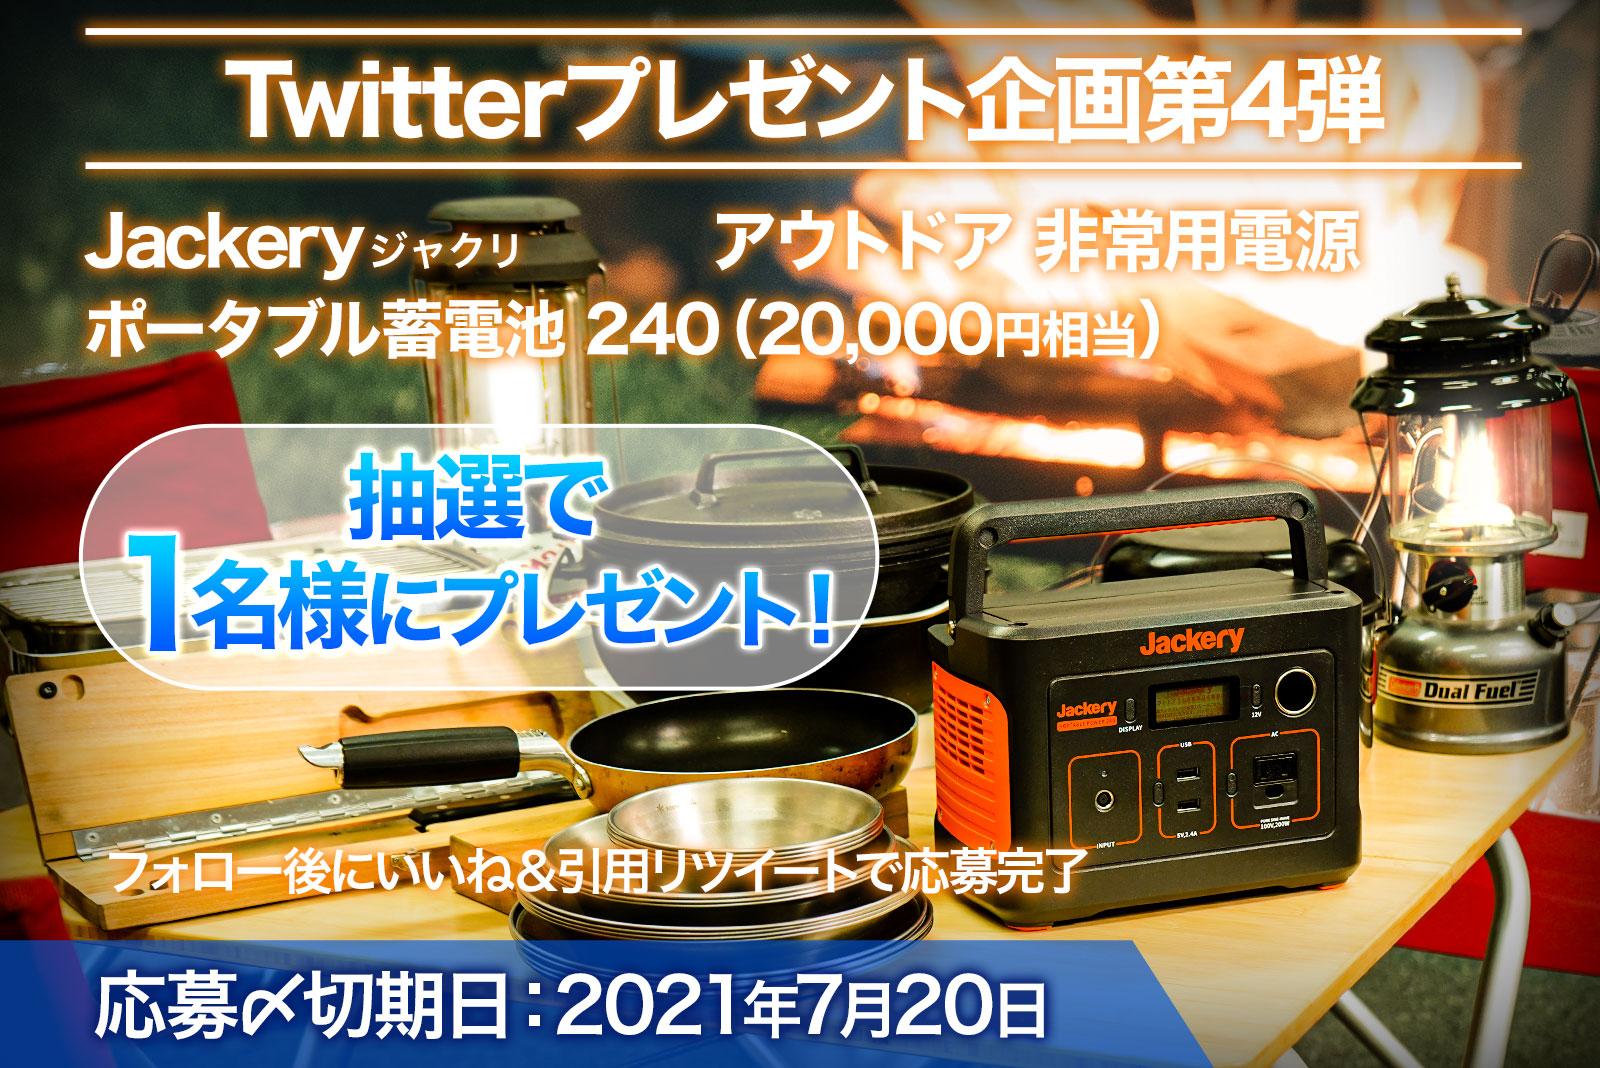 【twitterプレゼント企画第4弾】2万円相当のポータブル電源が当たる!7月20日(火)応募〆切